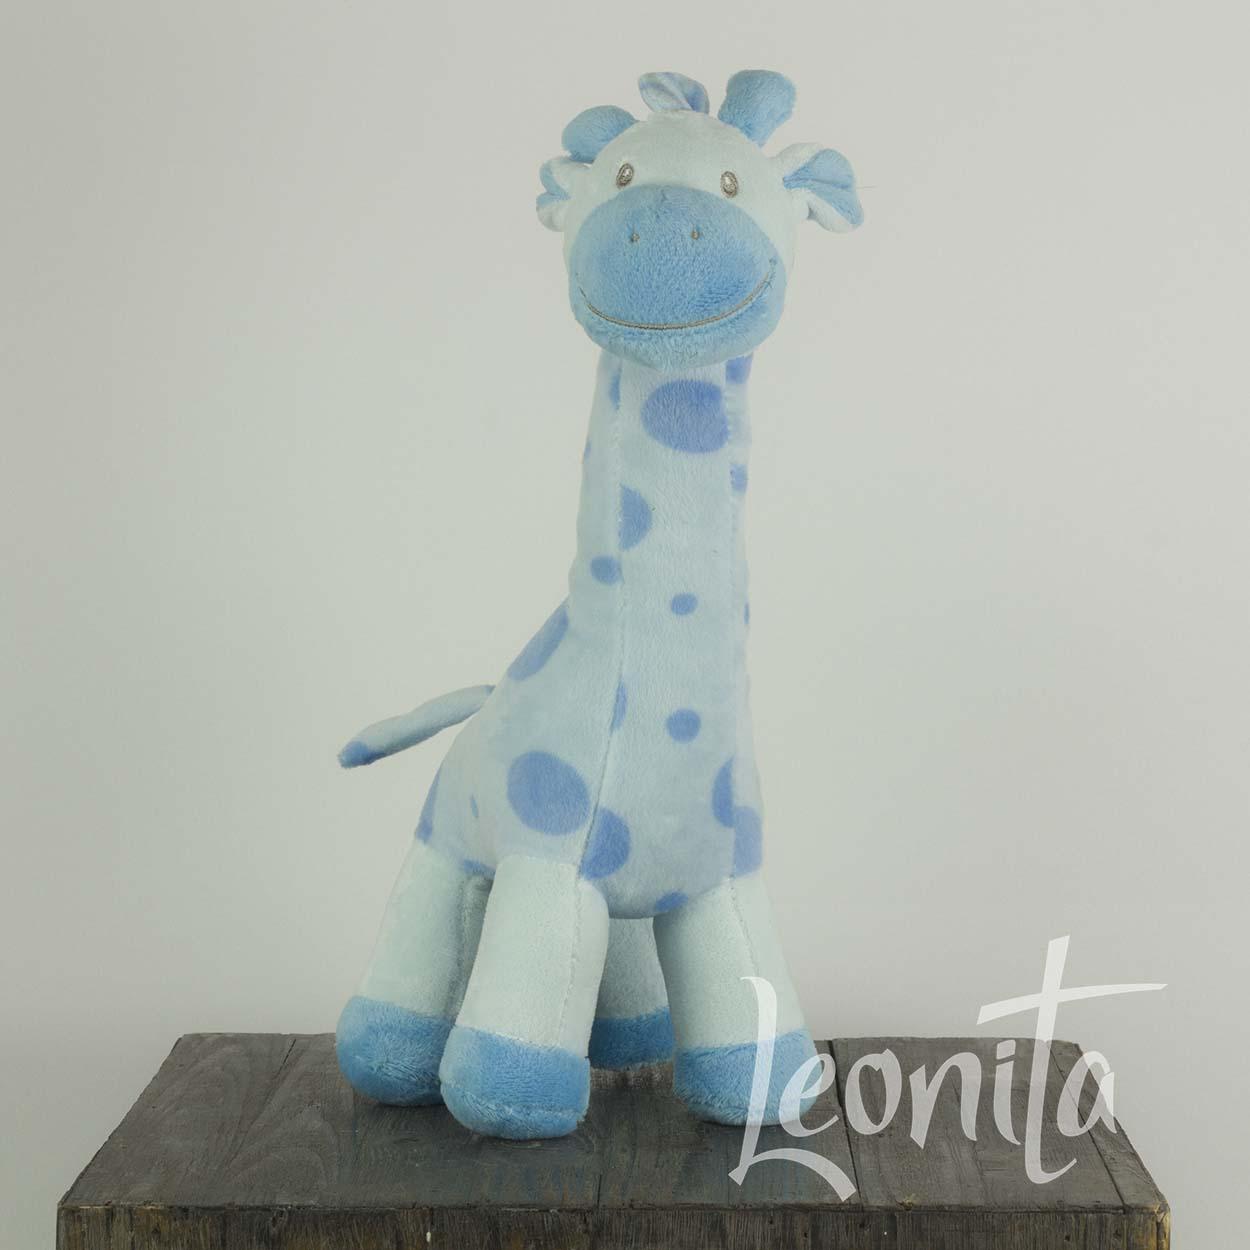 dbe2927e5088ee Knuffel Giraf Blauw - Leonita